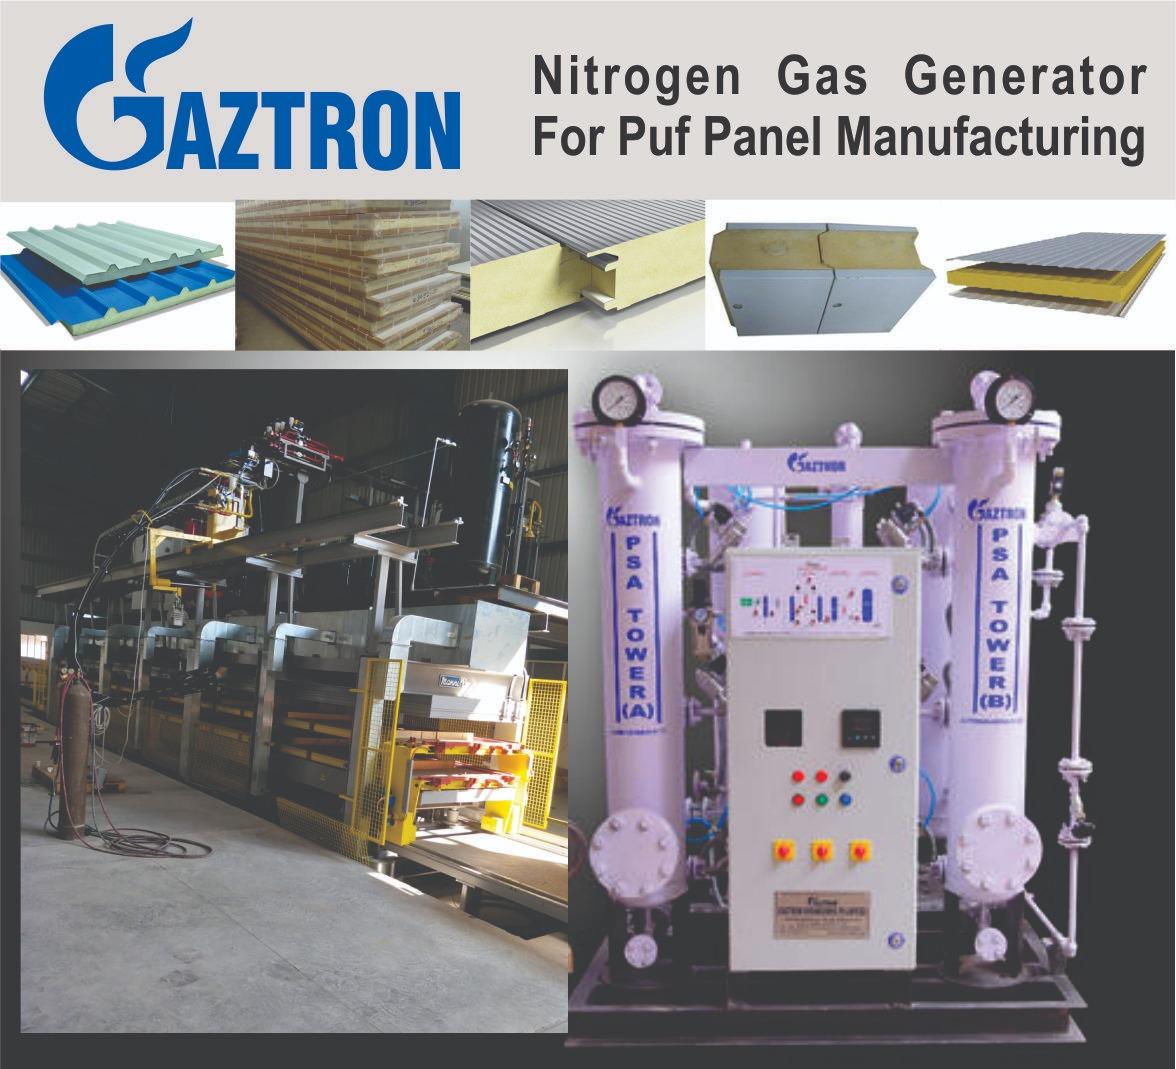 Nitrogen gas generator for puf panel manufacturing